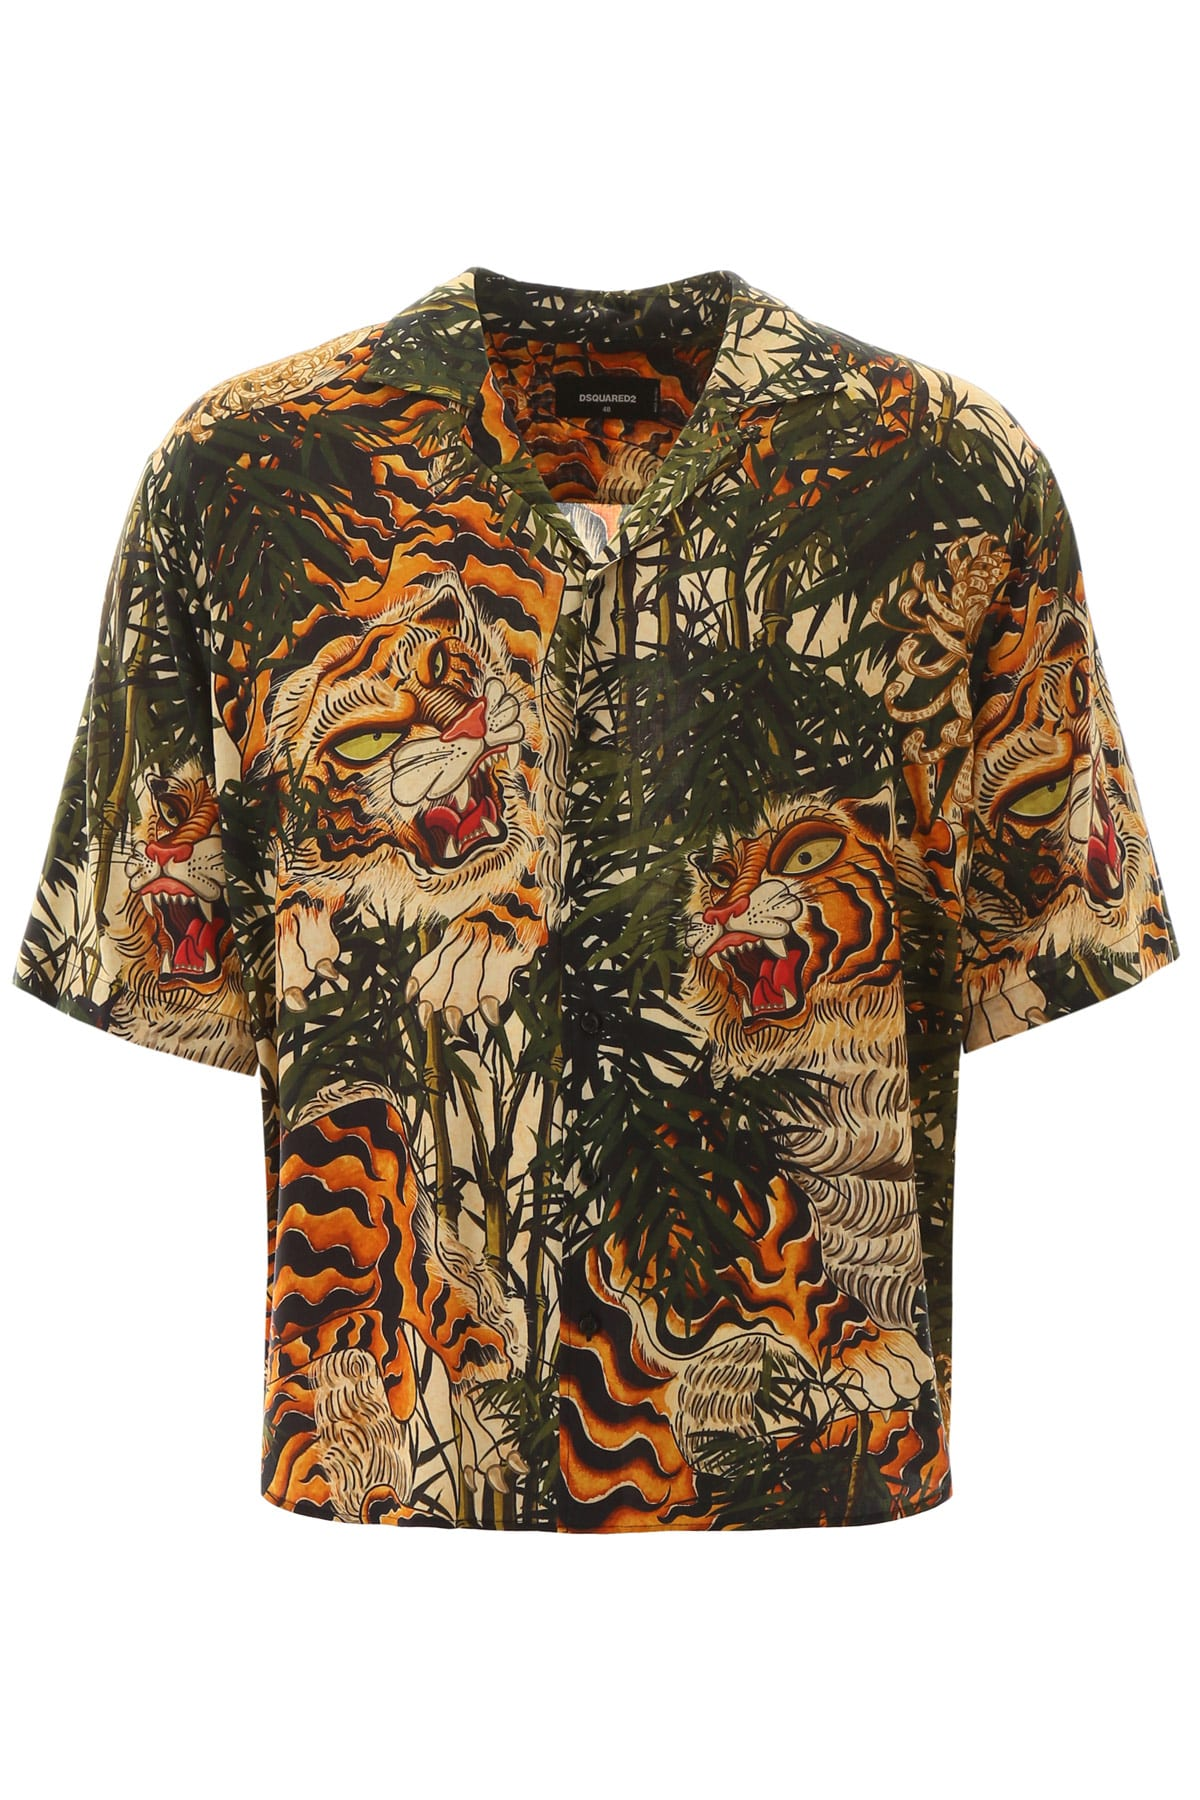 Dsquared2 Tiger Bamboo Shirt